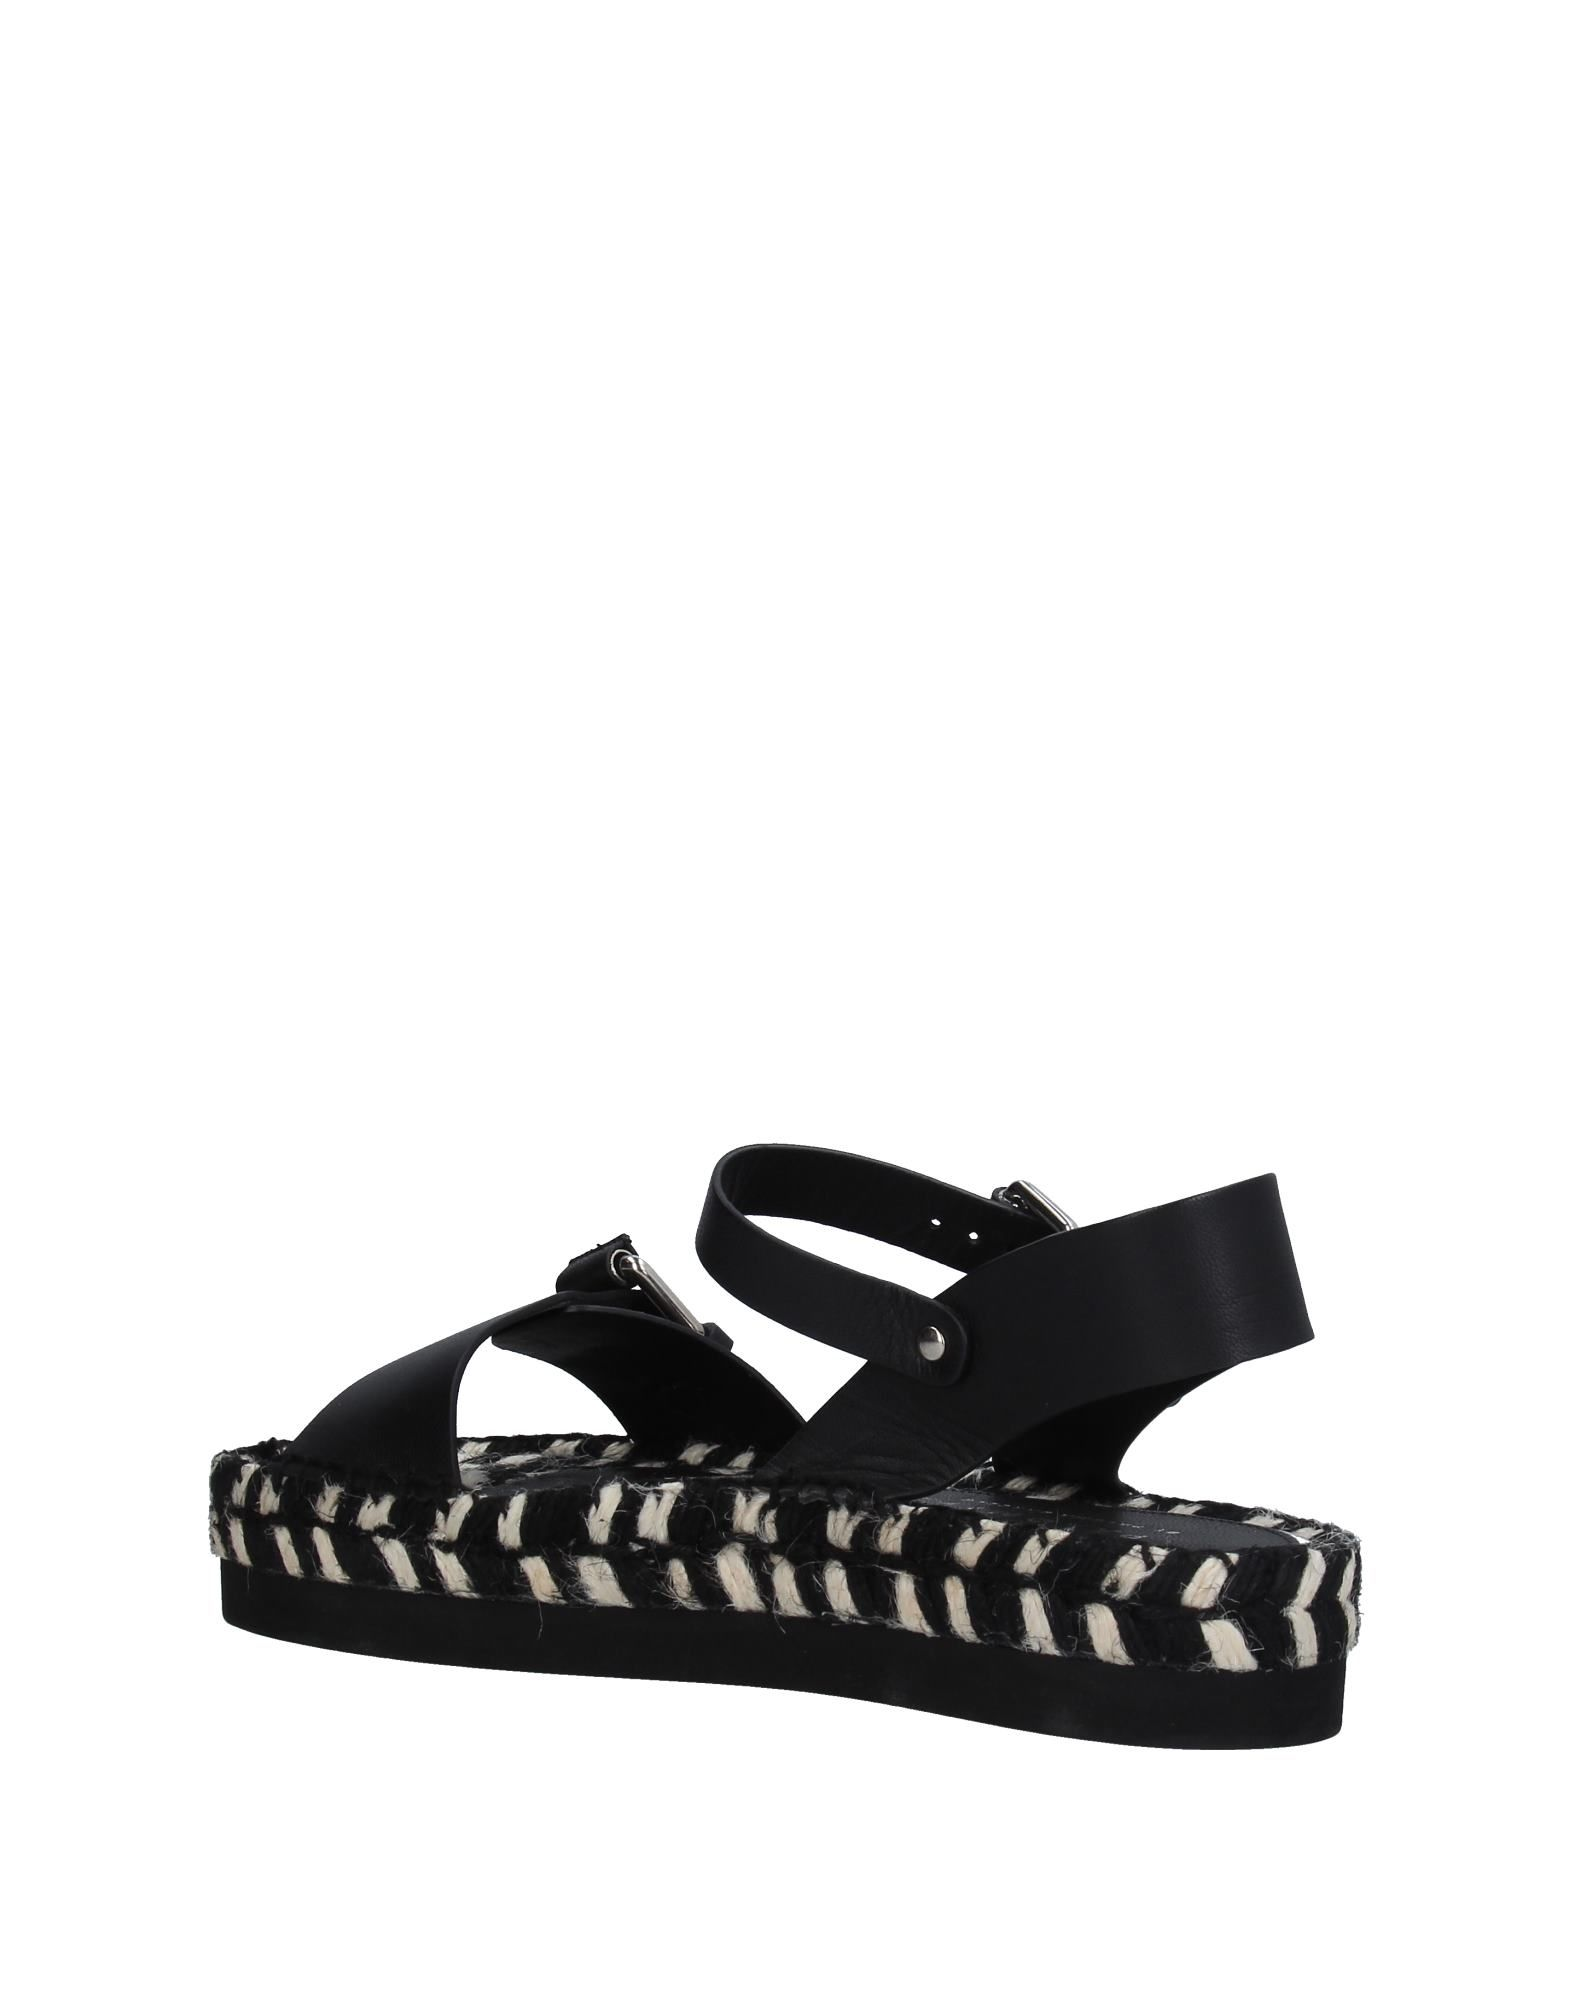 palomitas par paloma barcel & # 243; sandales - - - femmes palomitas par paloma barcel & # 243; sandales en ligne sur canada - 11255437ol 3baa66